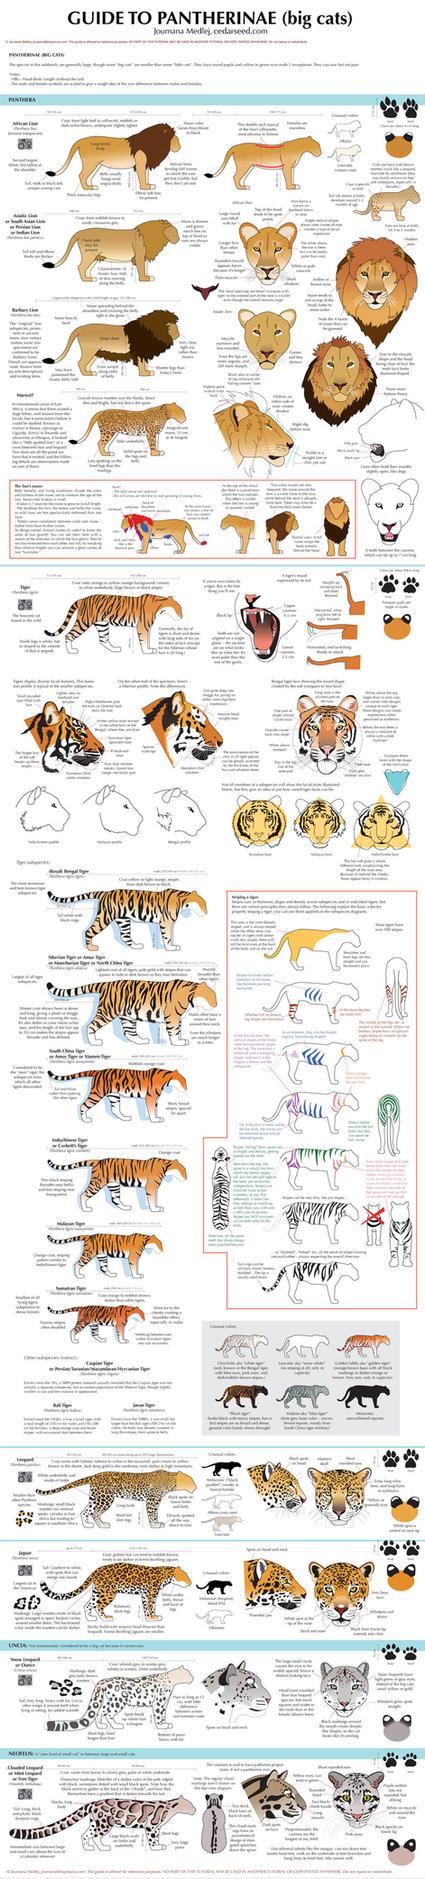 Guide to Big cats by Majnouna